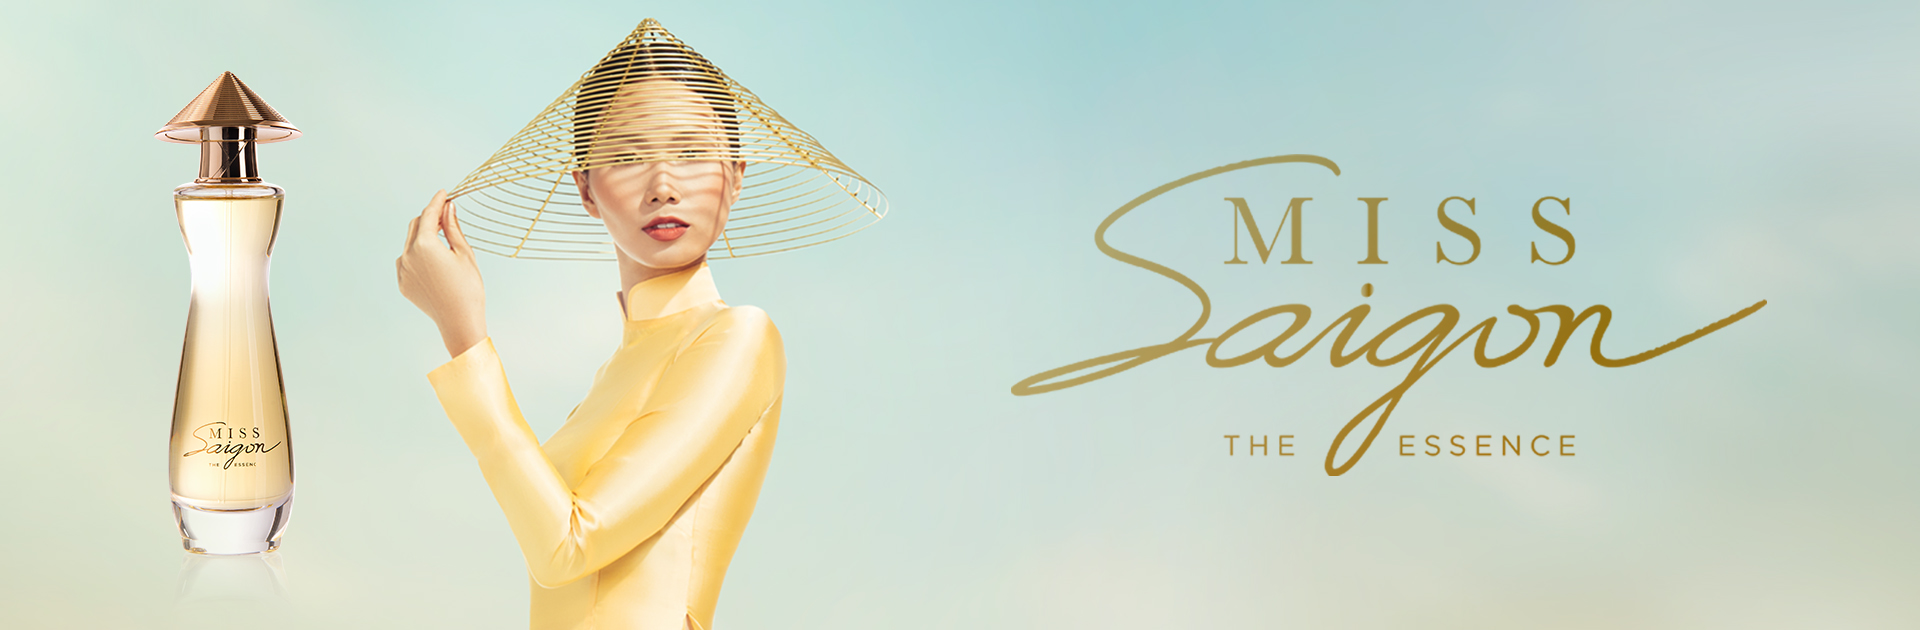 Miss Saigon The Essence